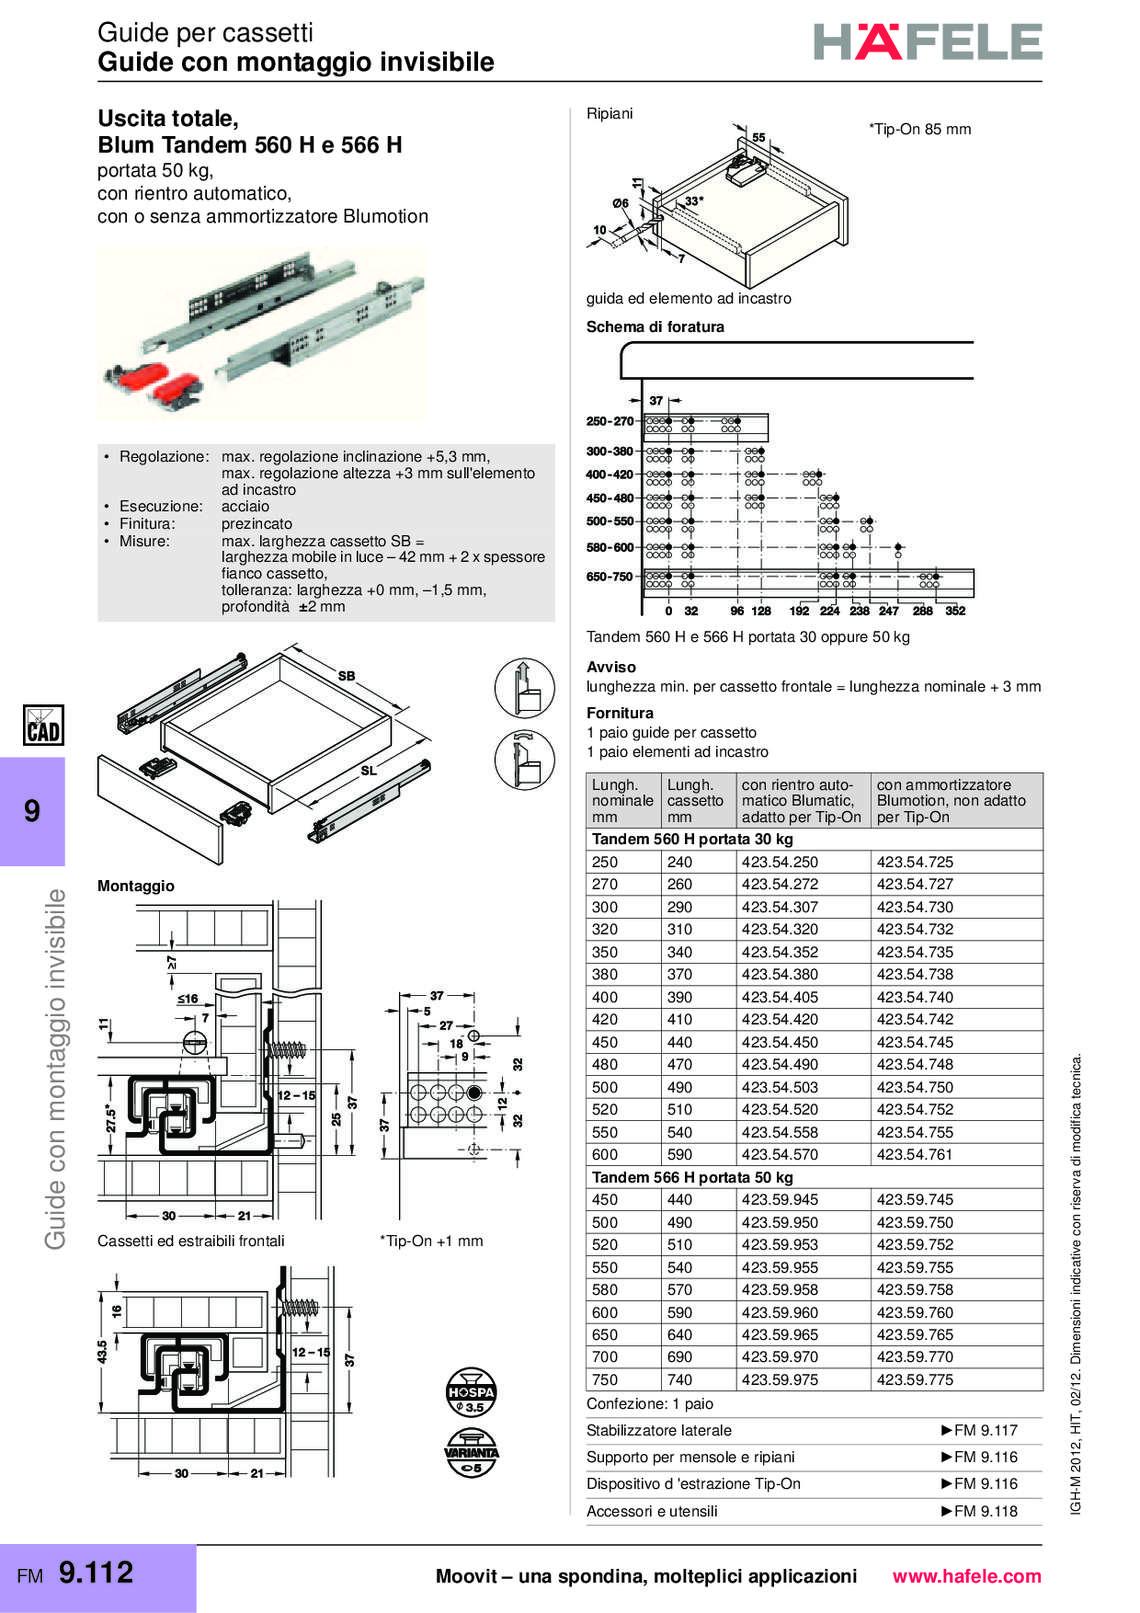 hafele-spondine-e-guide-per-mobili_40_159.jpg